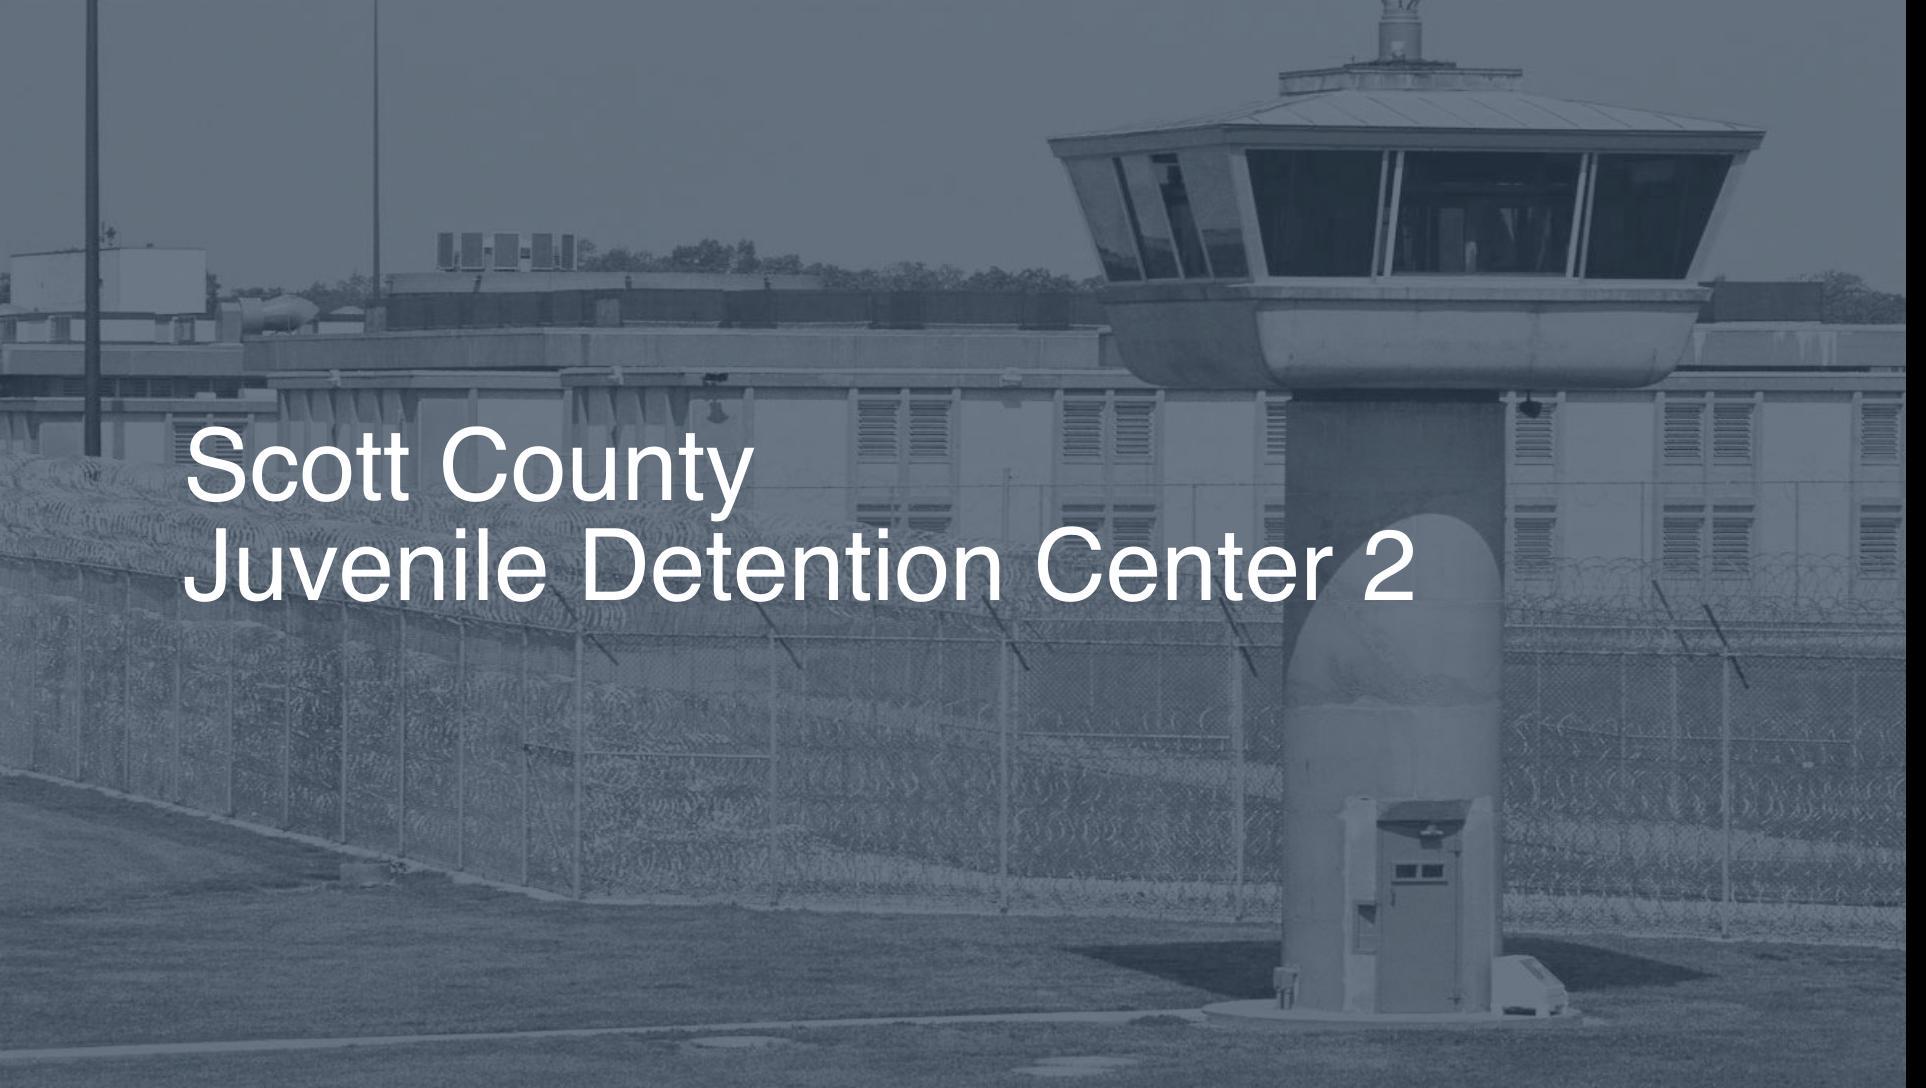 Scott County Juvenile Detention Center correctional facility picture